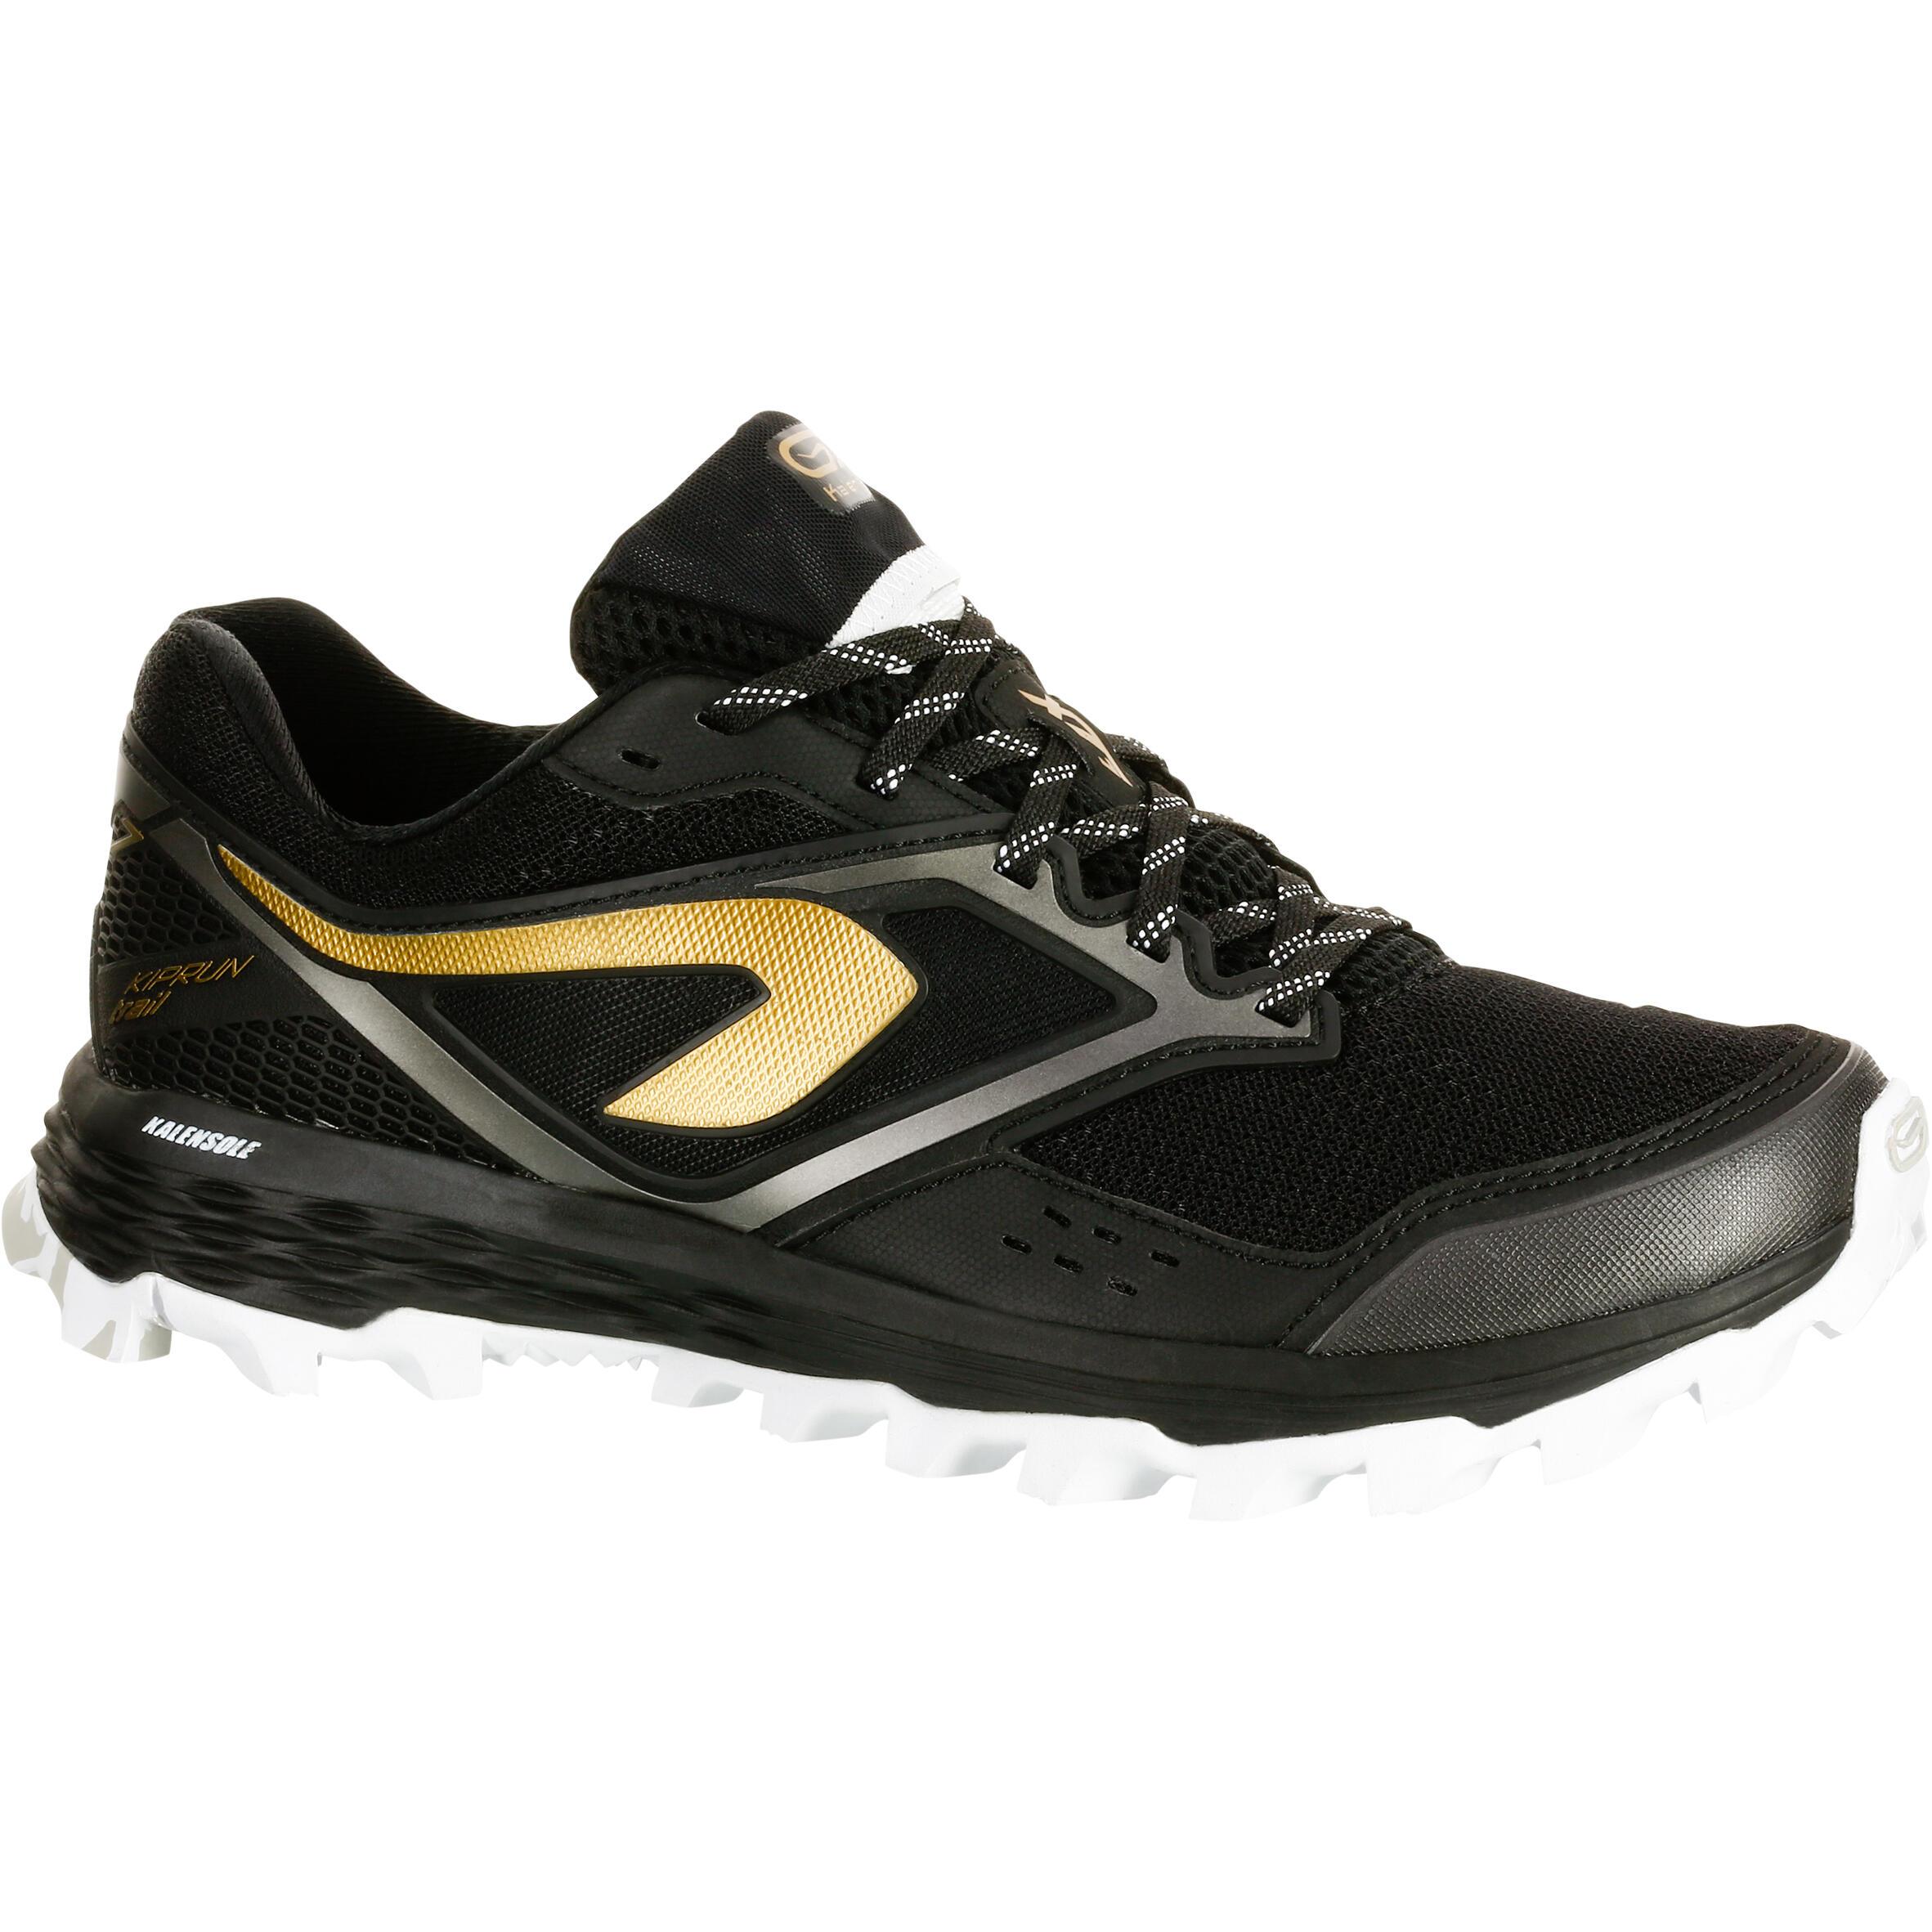 Kalenji Trailschoenen voor dames XT7 zwart/brons